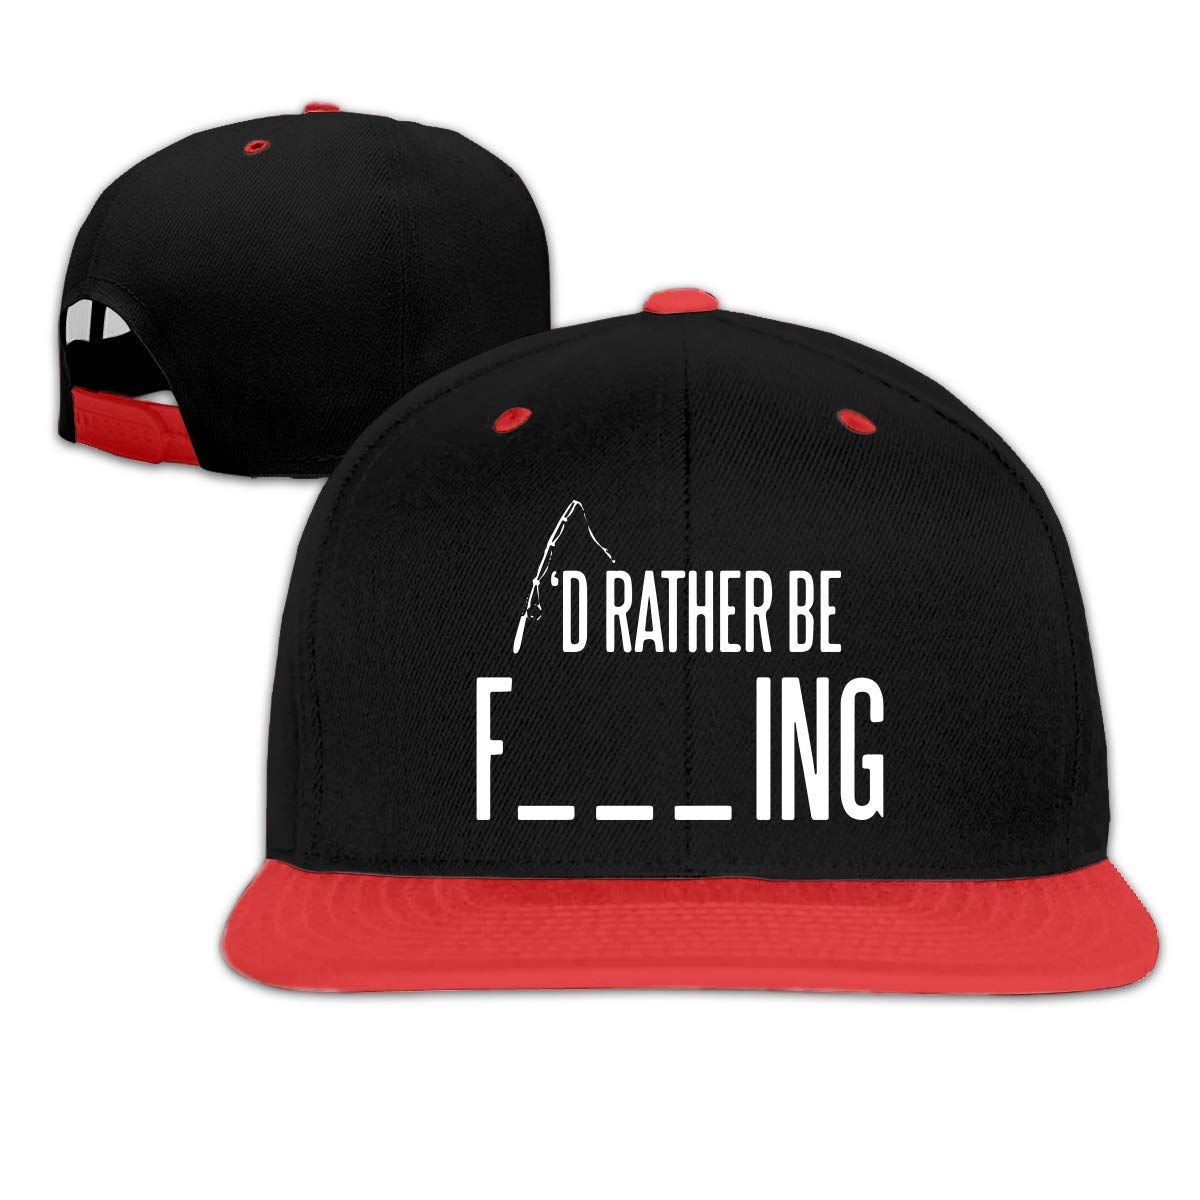 HERSTER Toddler Girls Rather Be Fishing Baseball Cap Hats Snapback Hiphop Cap Hats